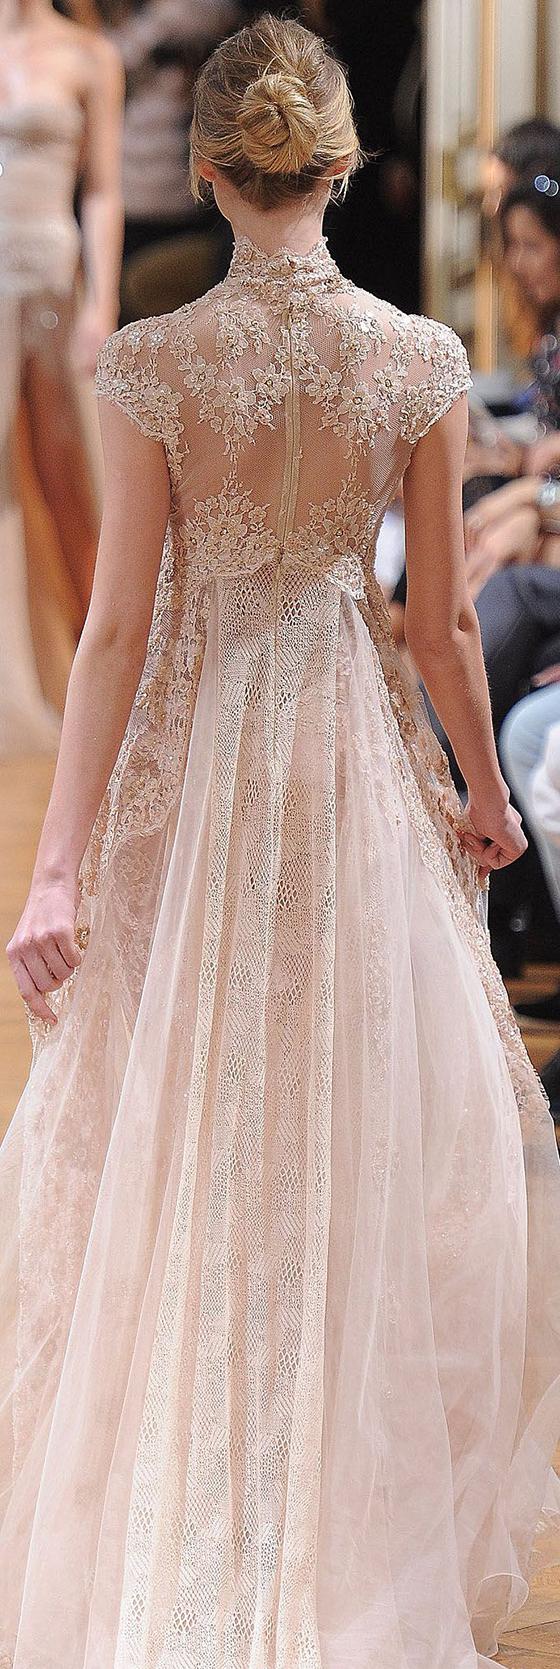 detailed-back-wedding-dress-4